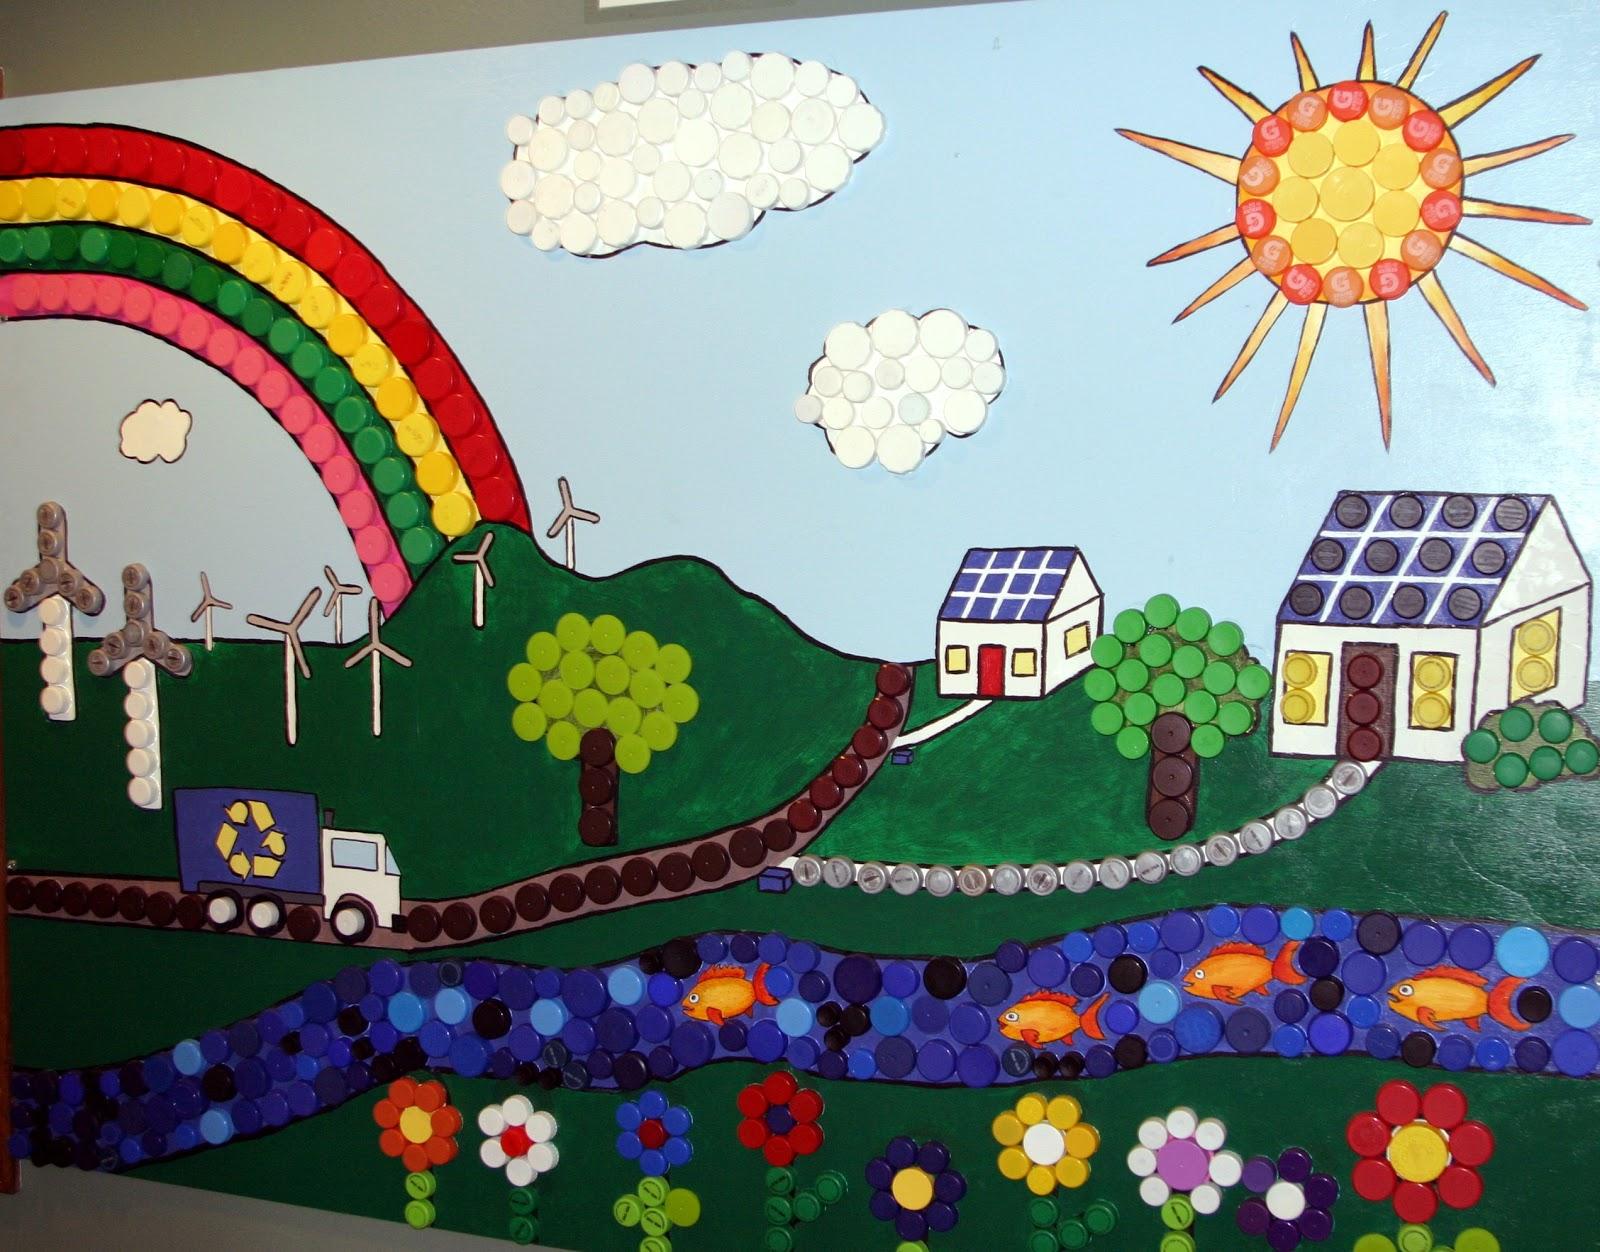 High School Wall Mural Ideas